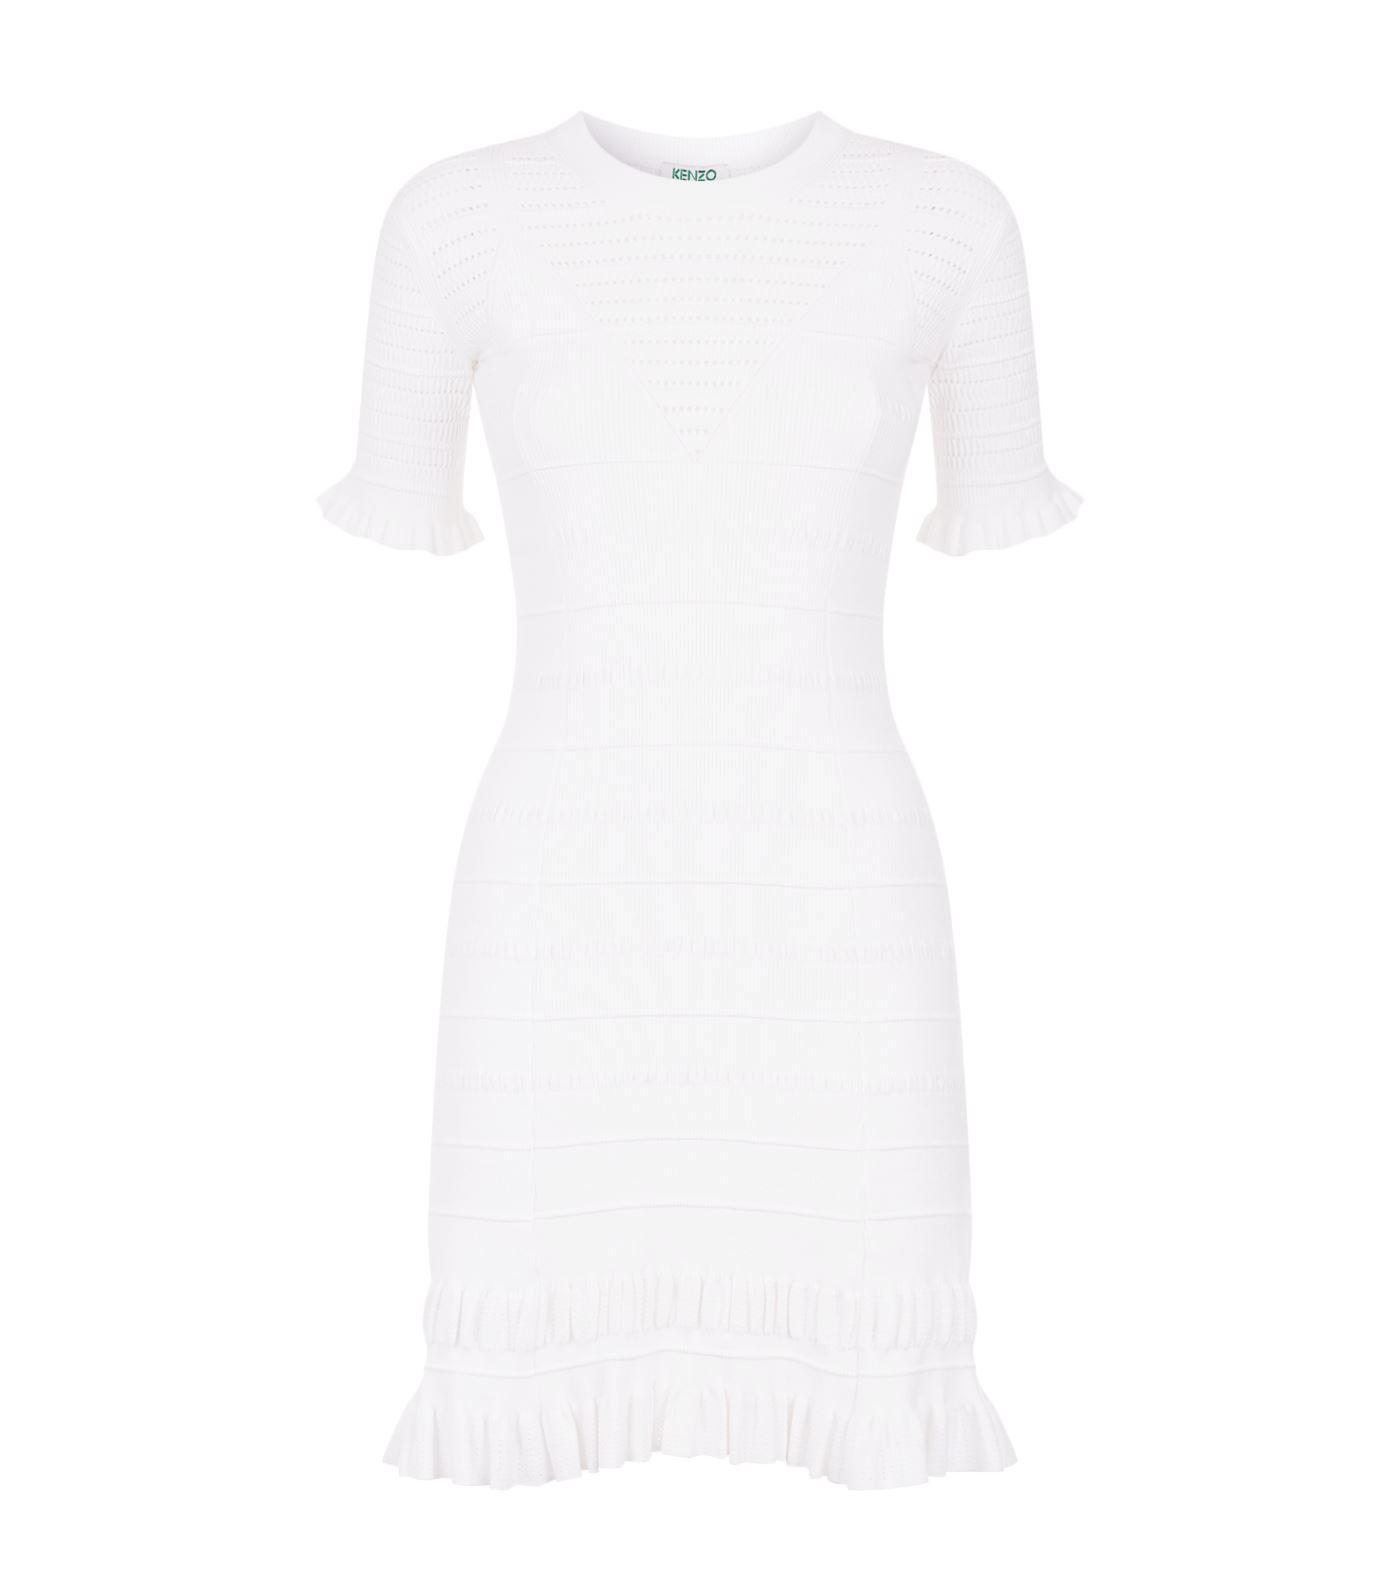 41c0c82ece40e Kenzo Short-Sleeve High-Neck Knit Dress With Flared Hem In White ...